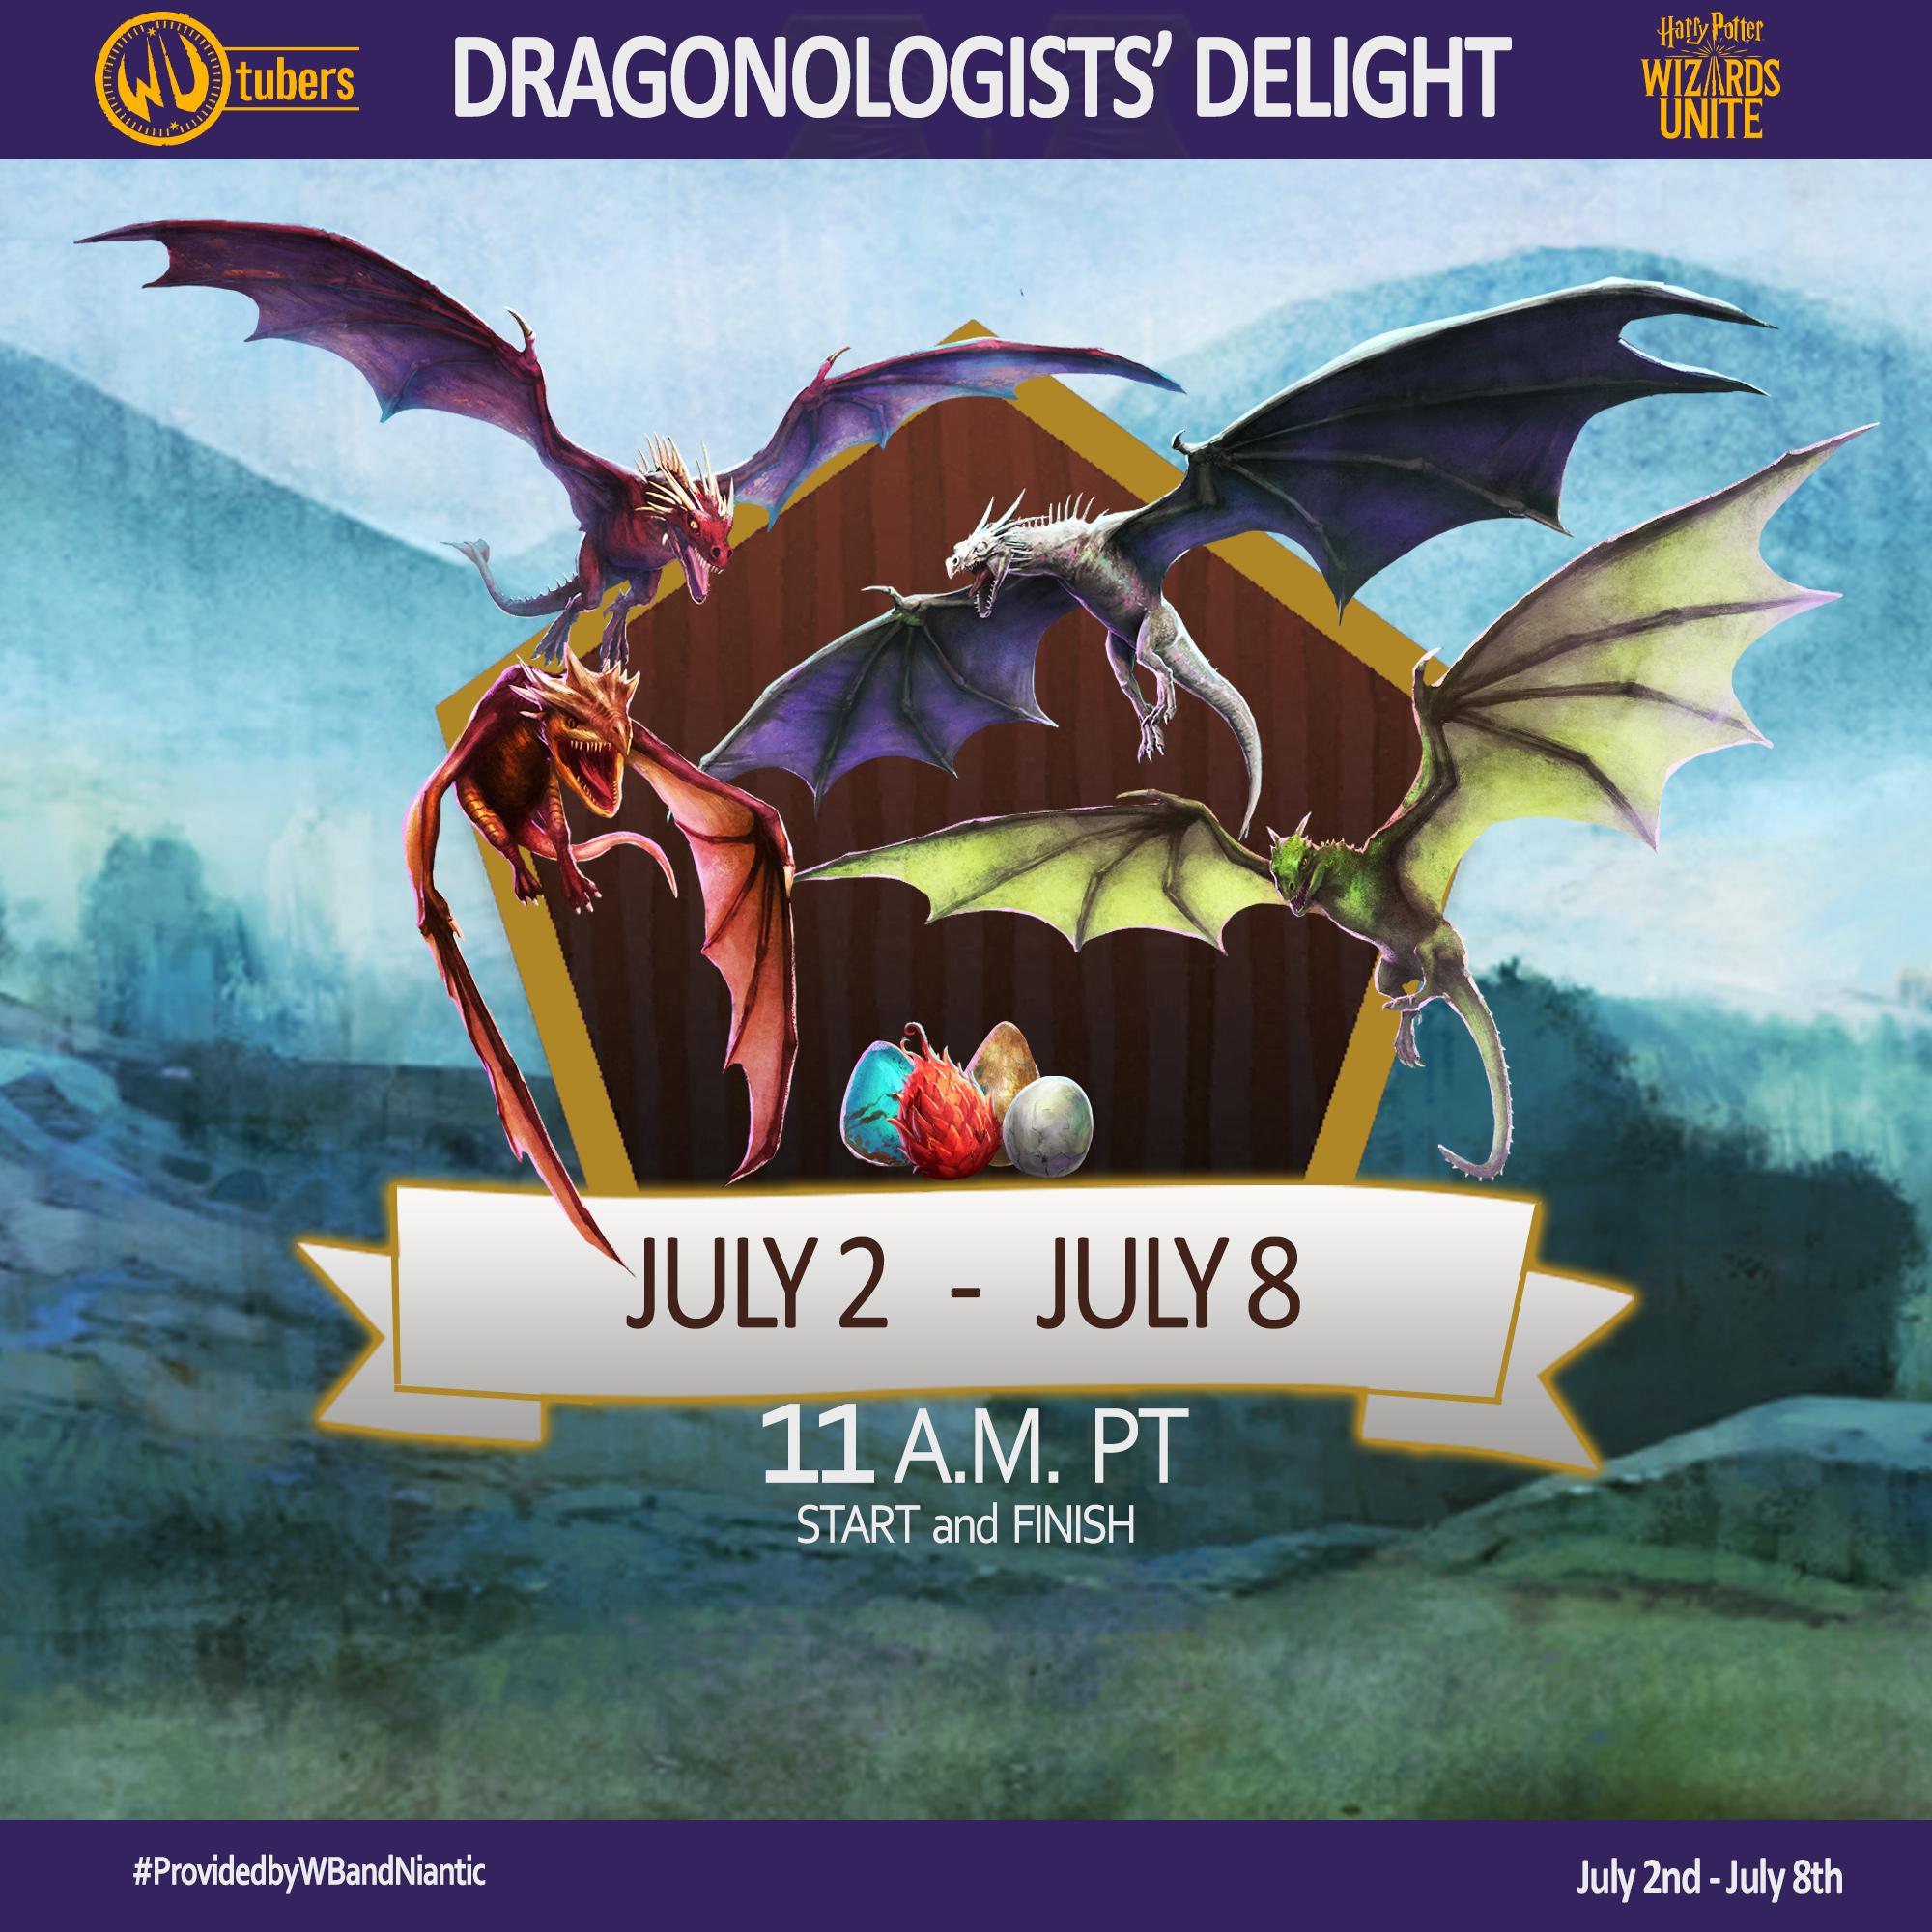 Dragon_Event_Date.jpg